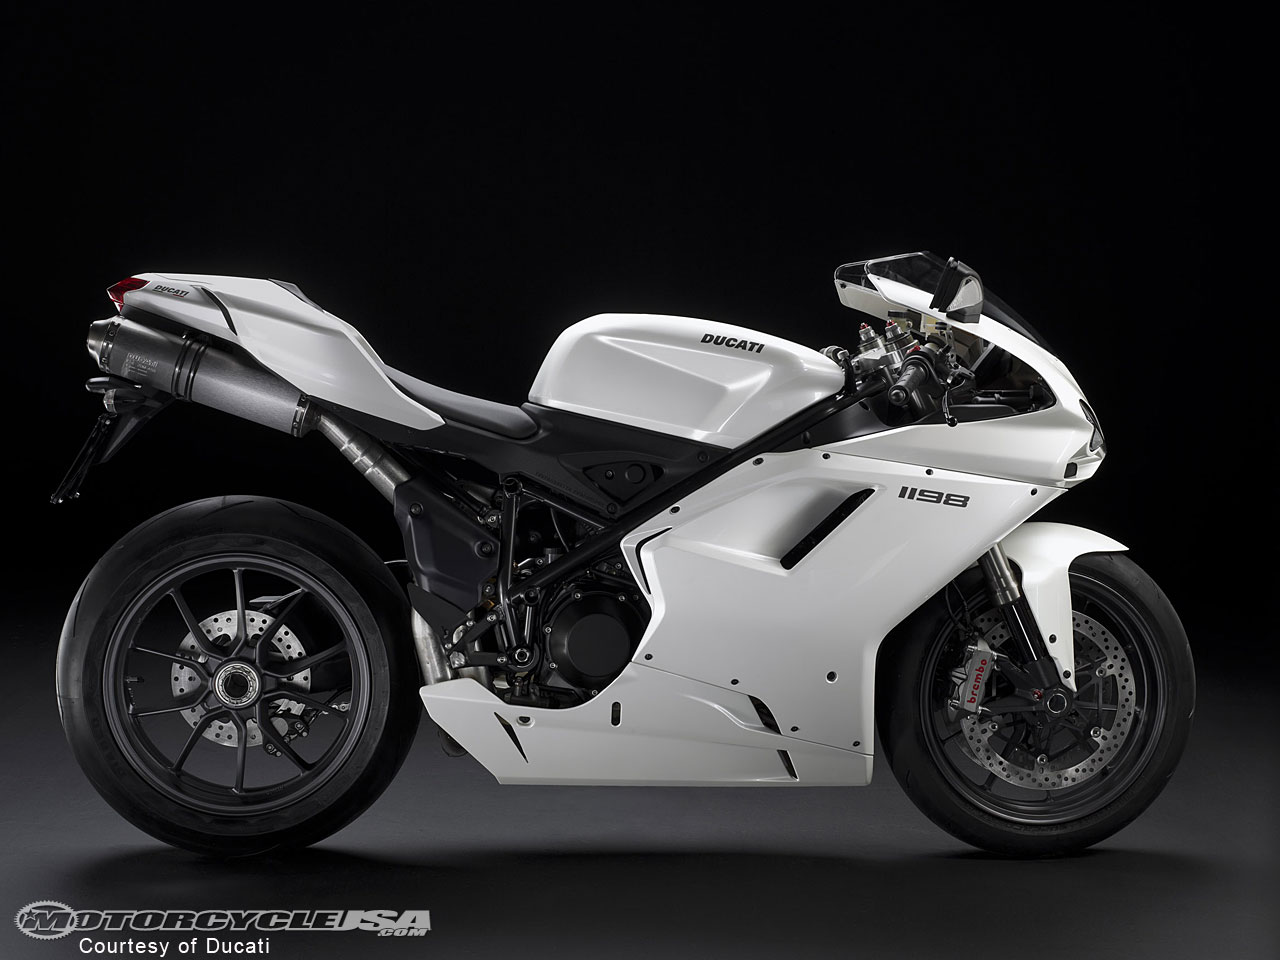 Ducati Motorcycle Wallpaper 7041 Hd Wallpapers in Bikes   Imagescicom 1280x960